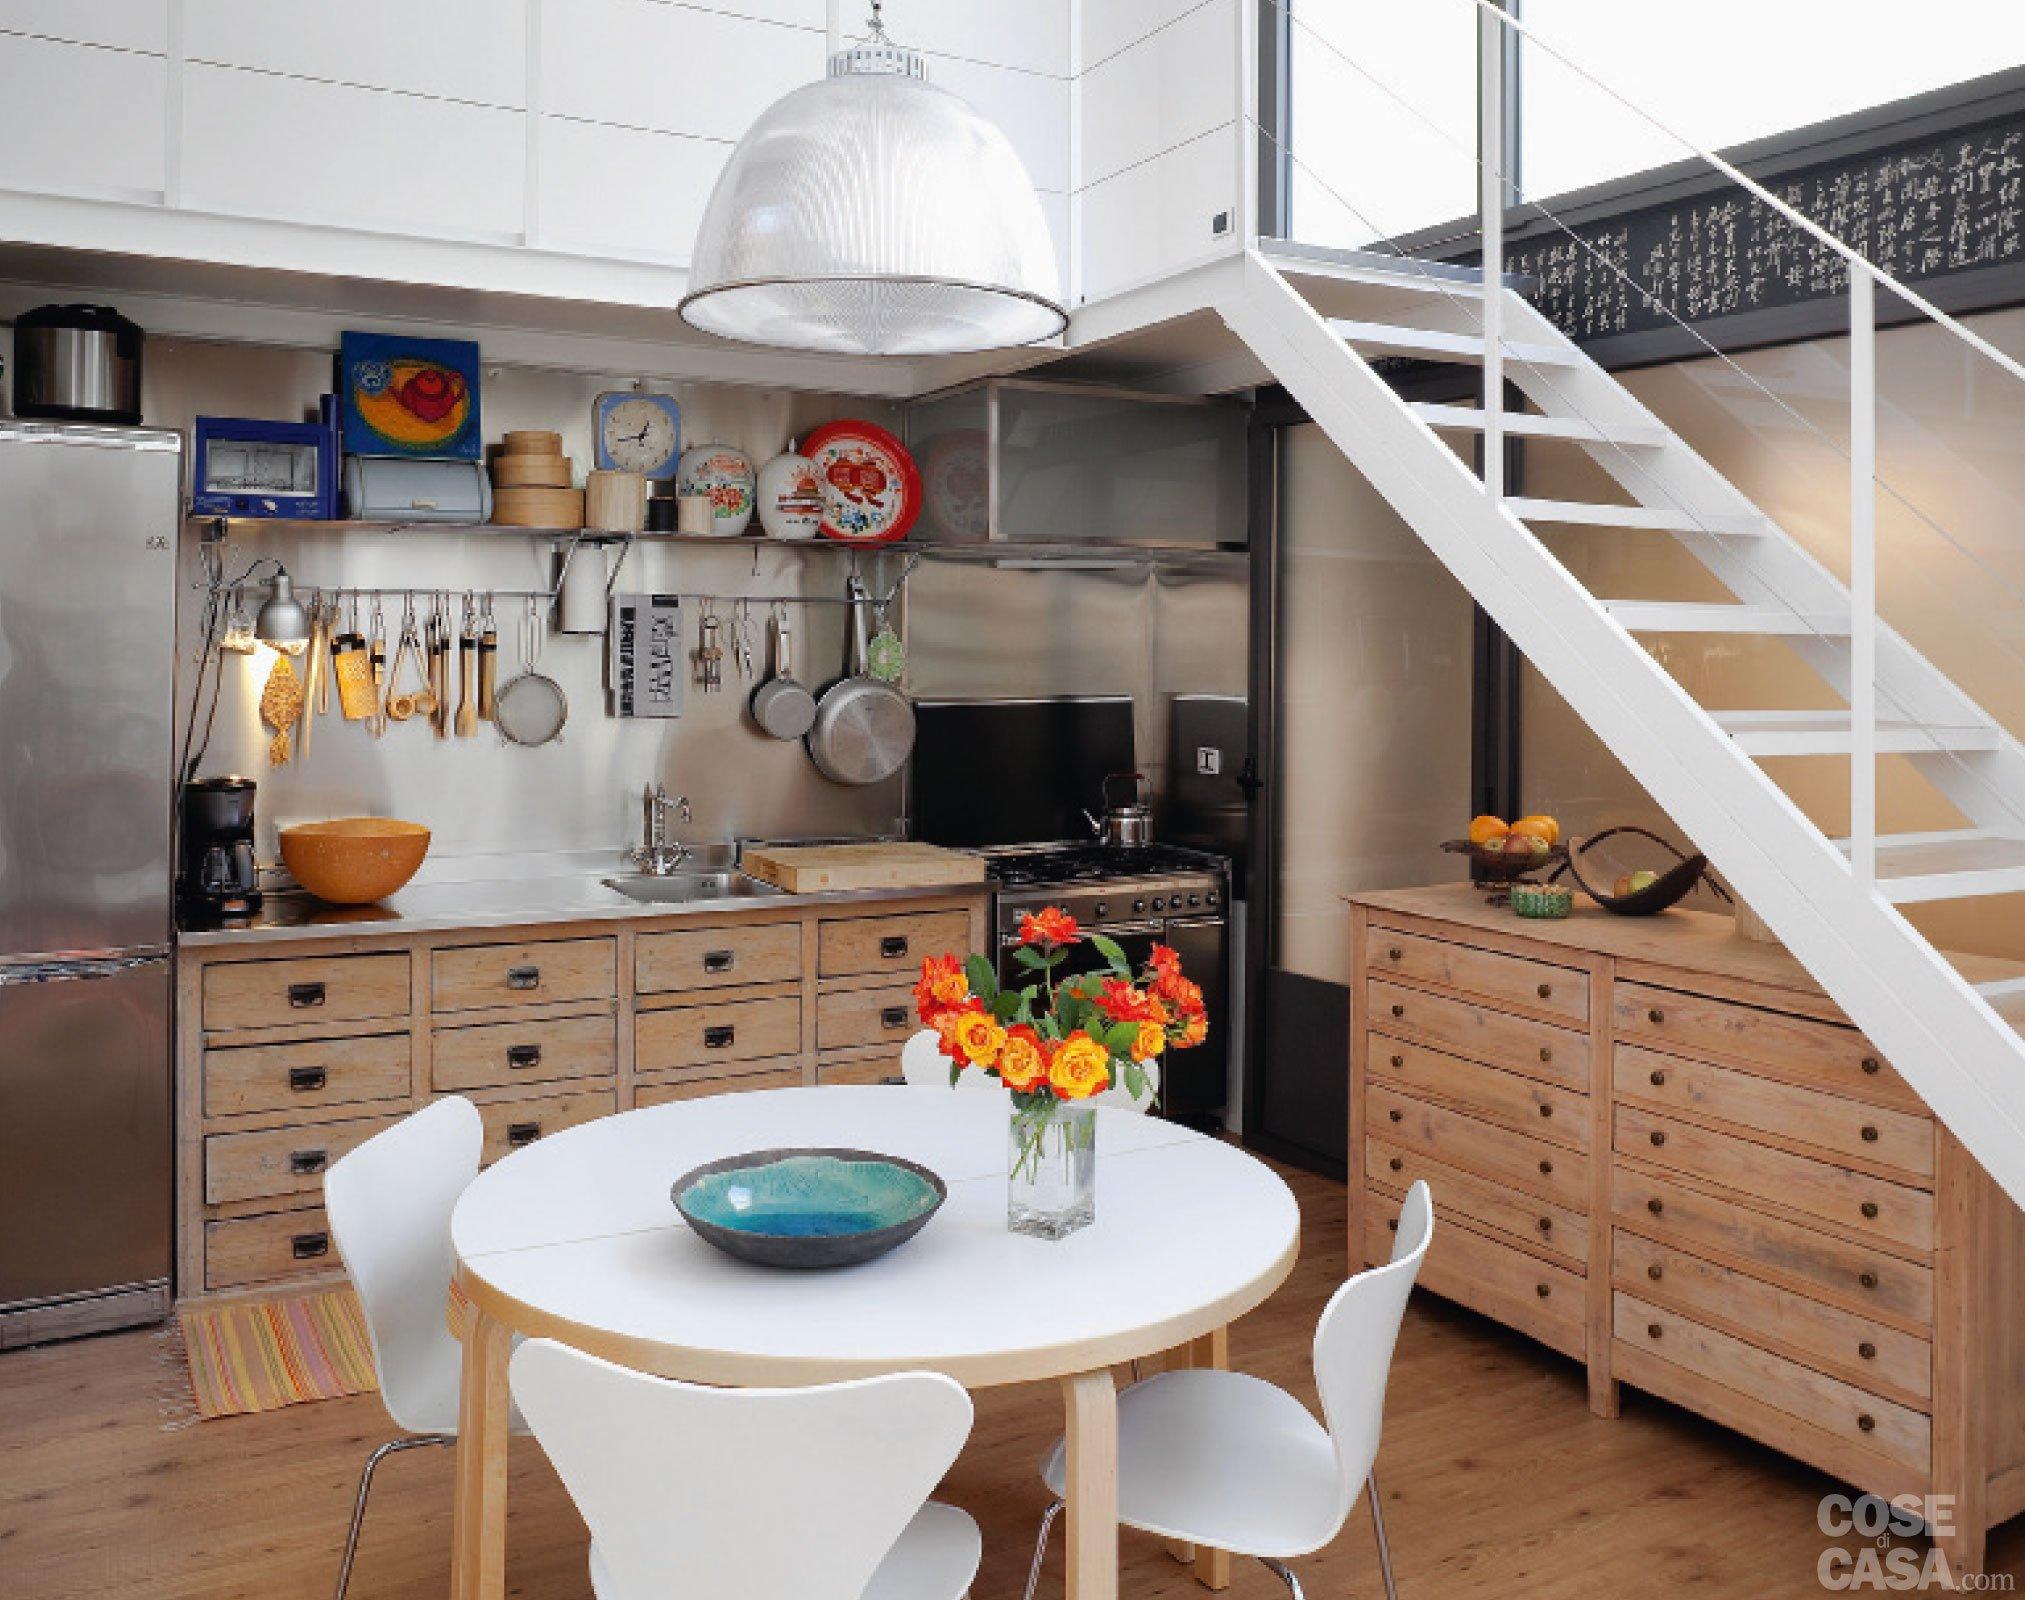 Isola cucina disegno tavolo - Comporre una cucina ...